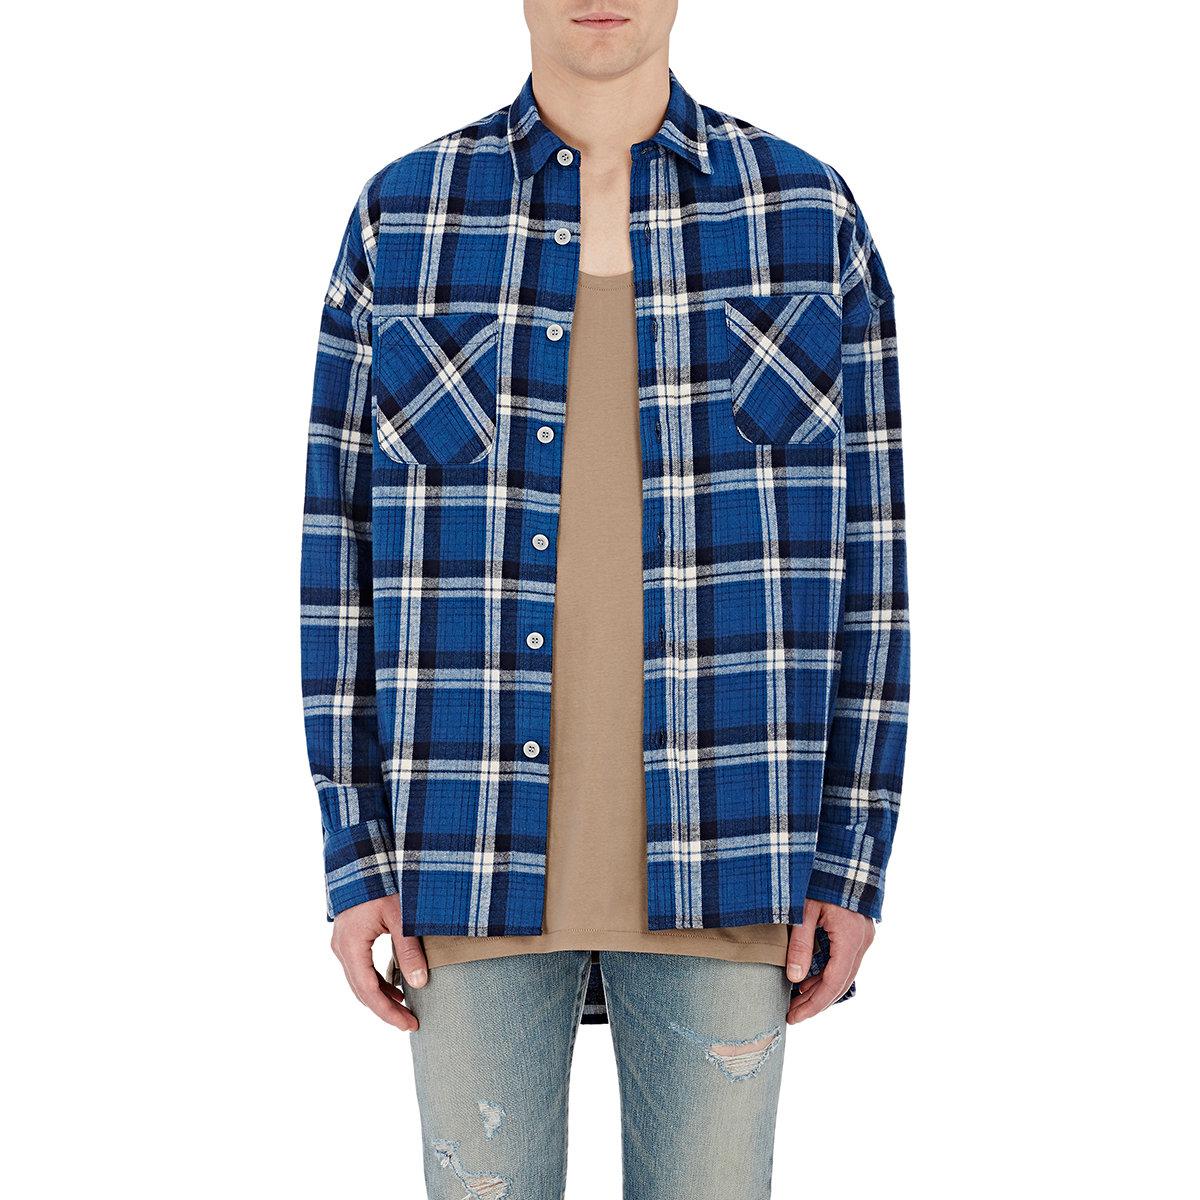 Fear Of God Plaid Flannel Shirt In Blue Lyst